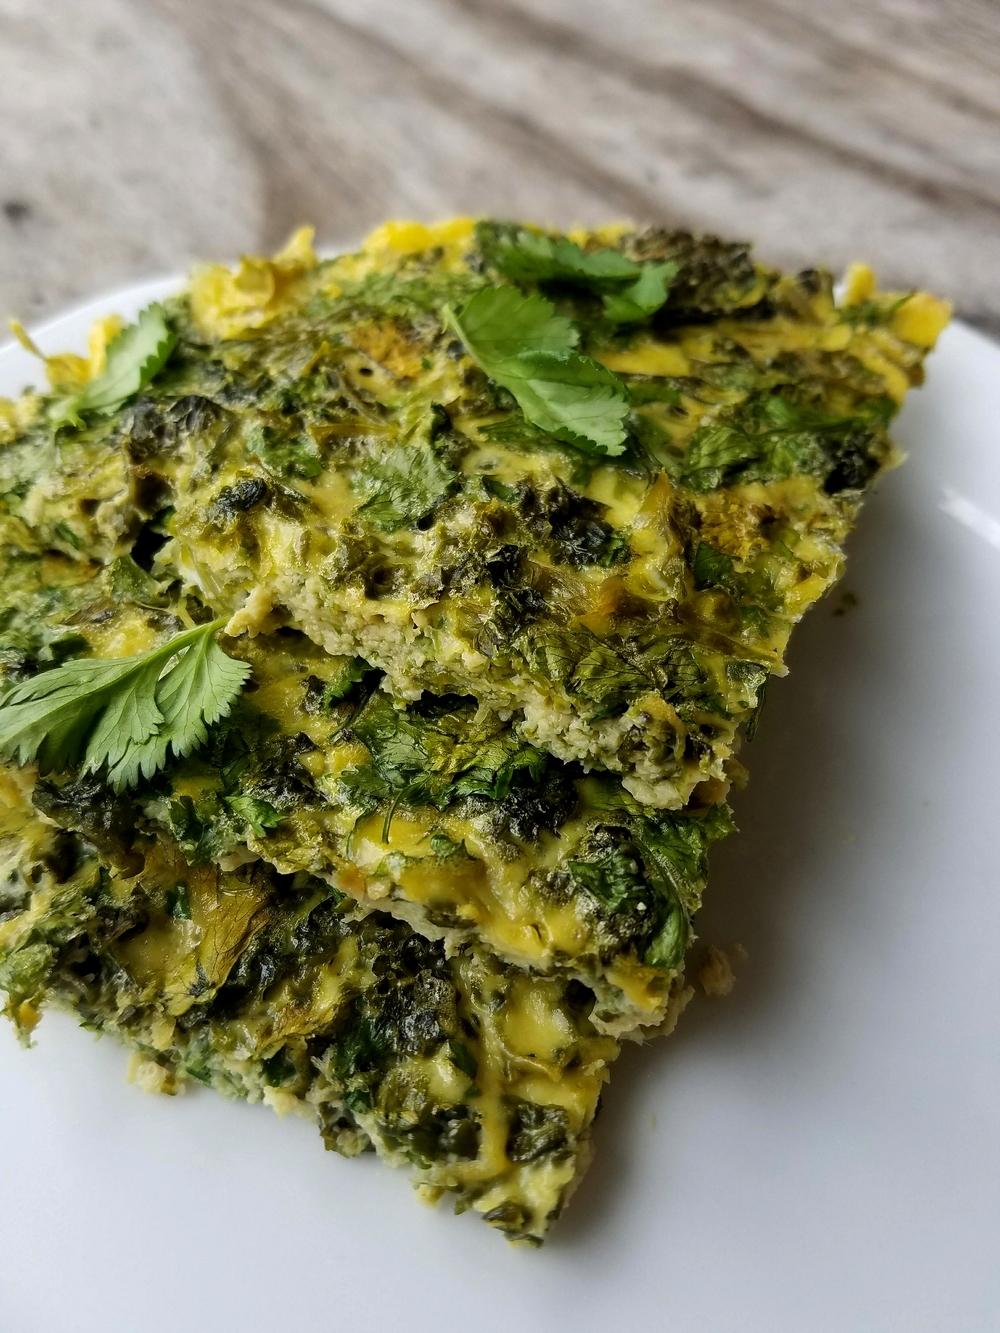 Recette d'Iran : le kuku iranien, omelette aux herbes